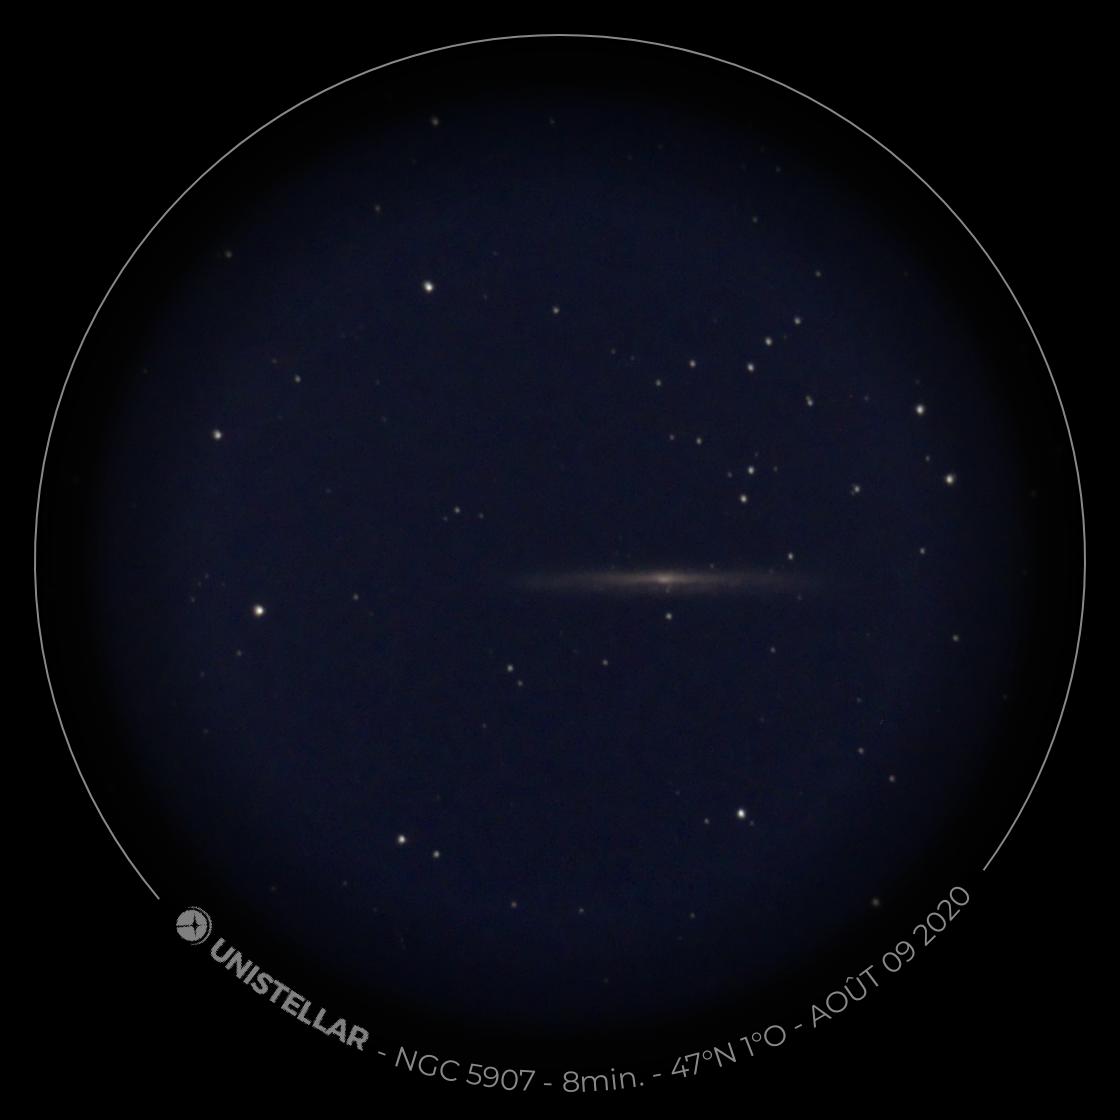 NGC5907_09-08-2020_117301944_296433131432968_7868830354084583921_n.png